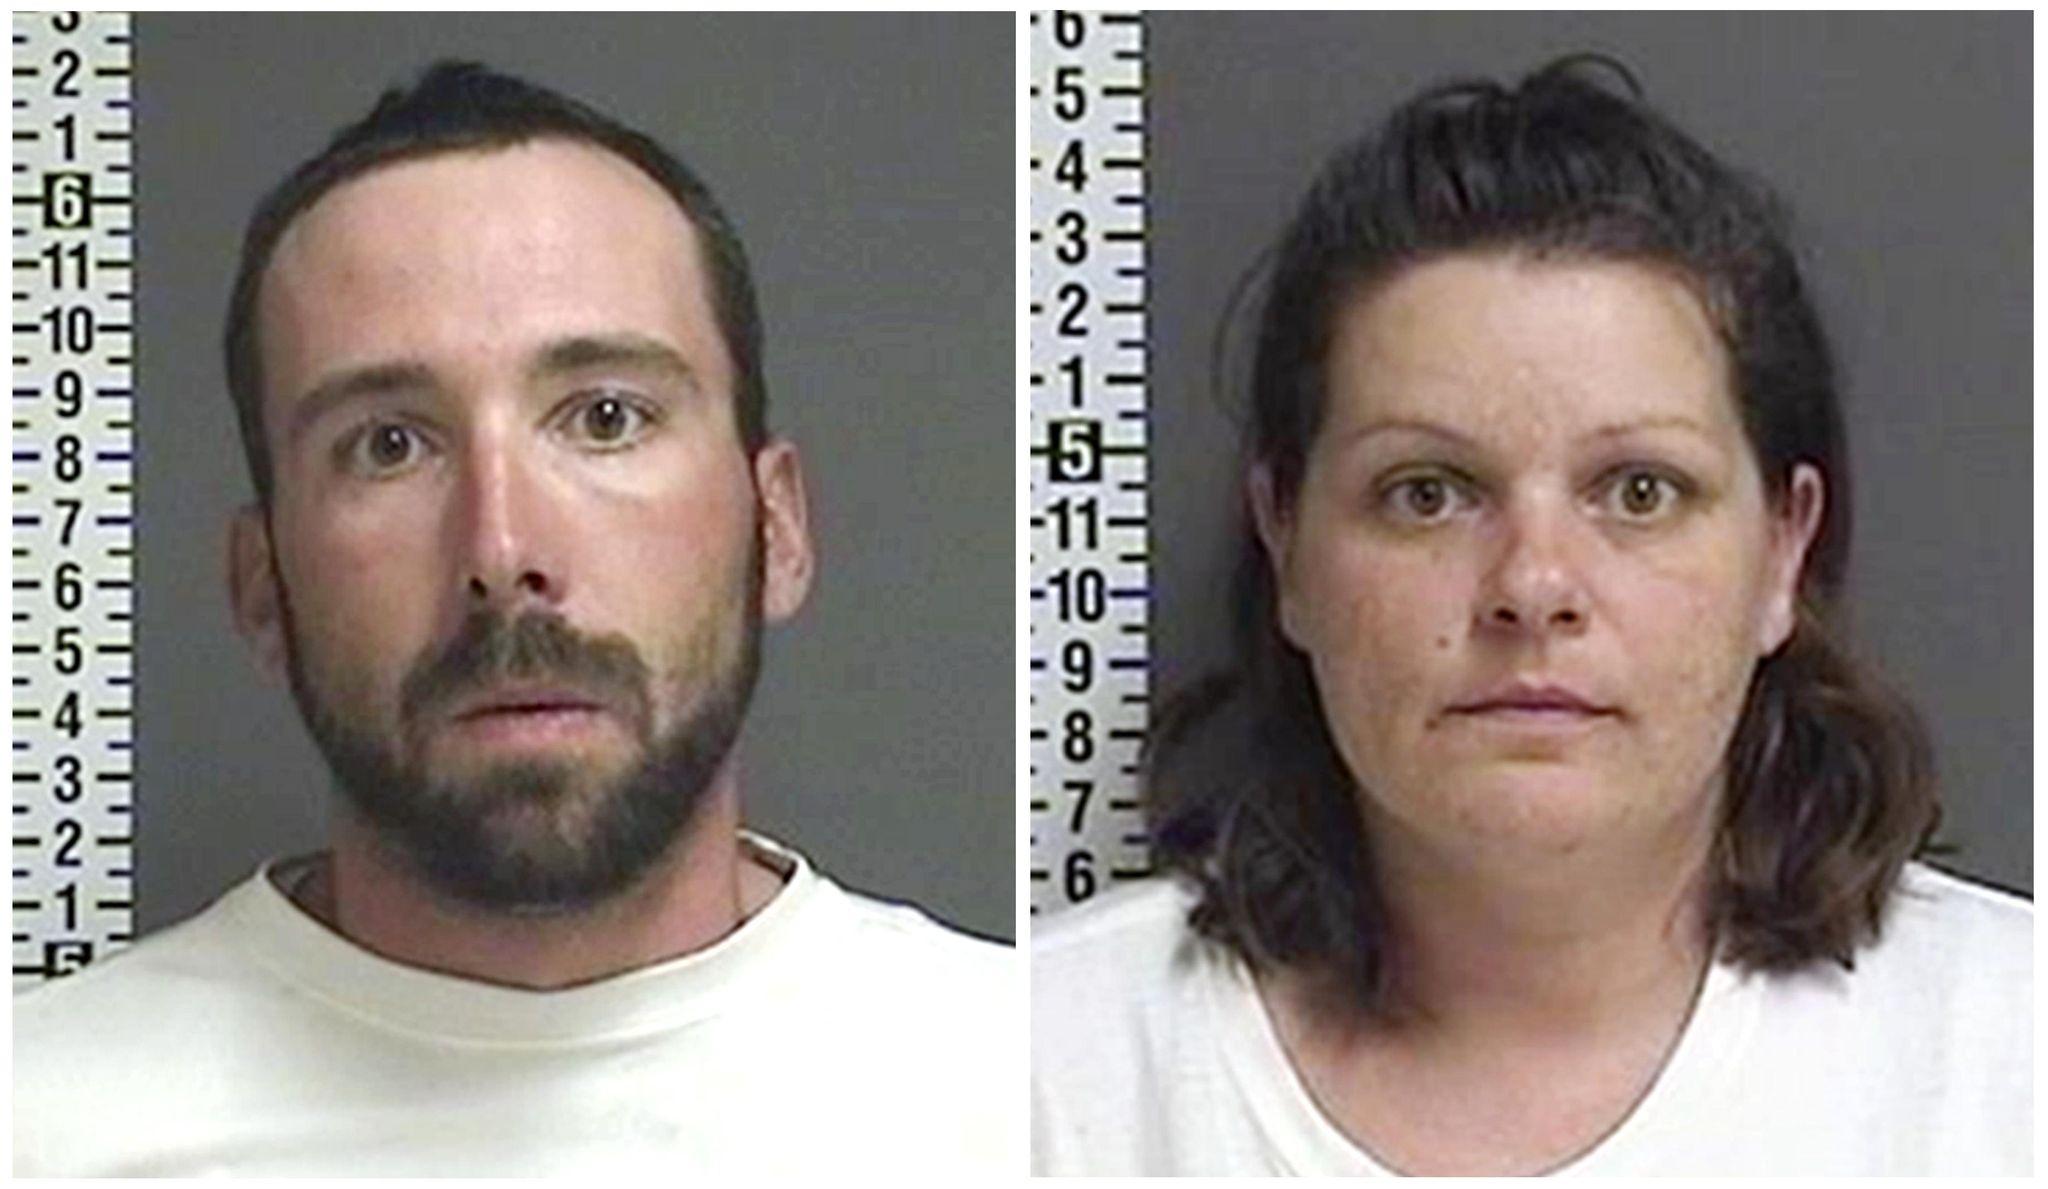 Pregnant woman's killer testifies against former boyfriend - Washington Times